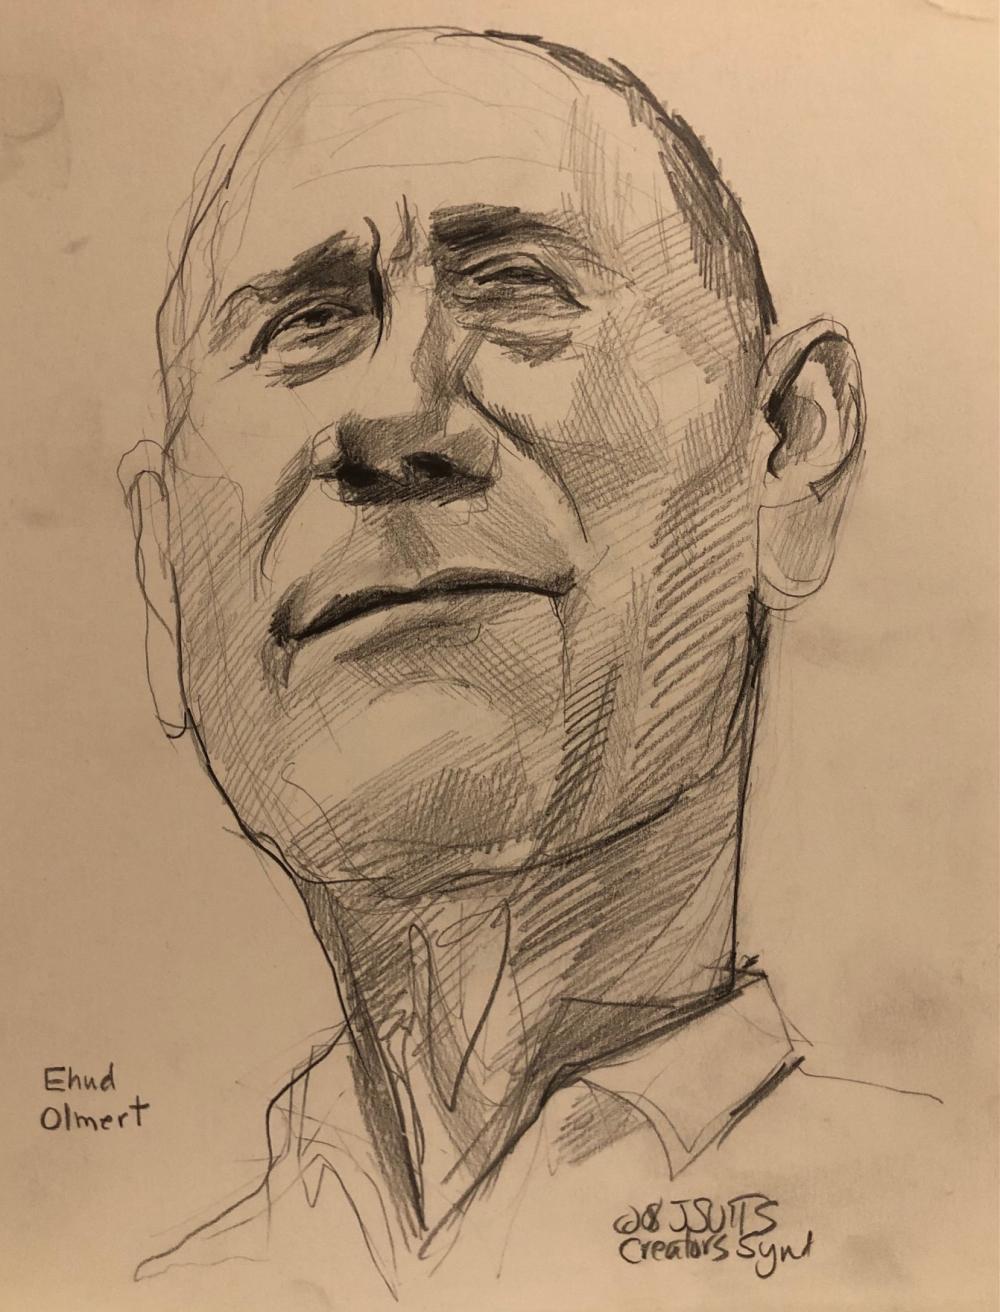 Ehud Olmert caricature